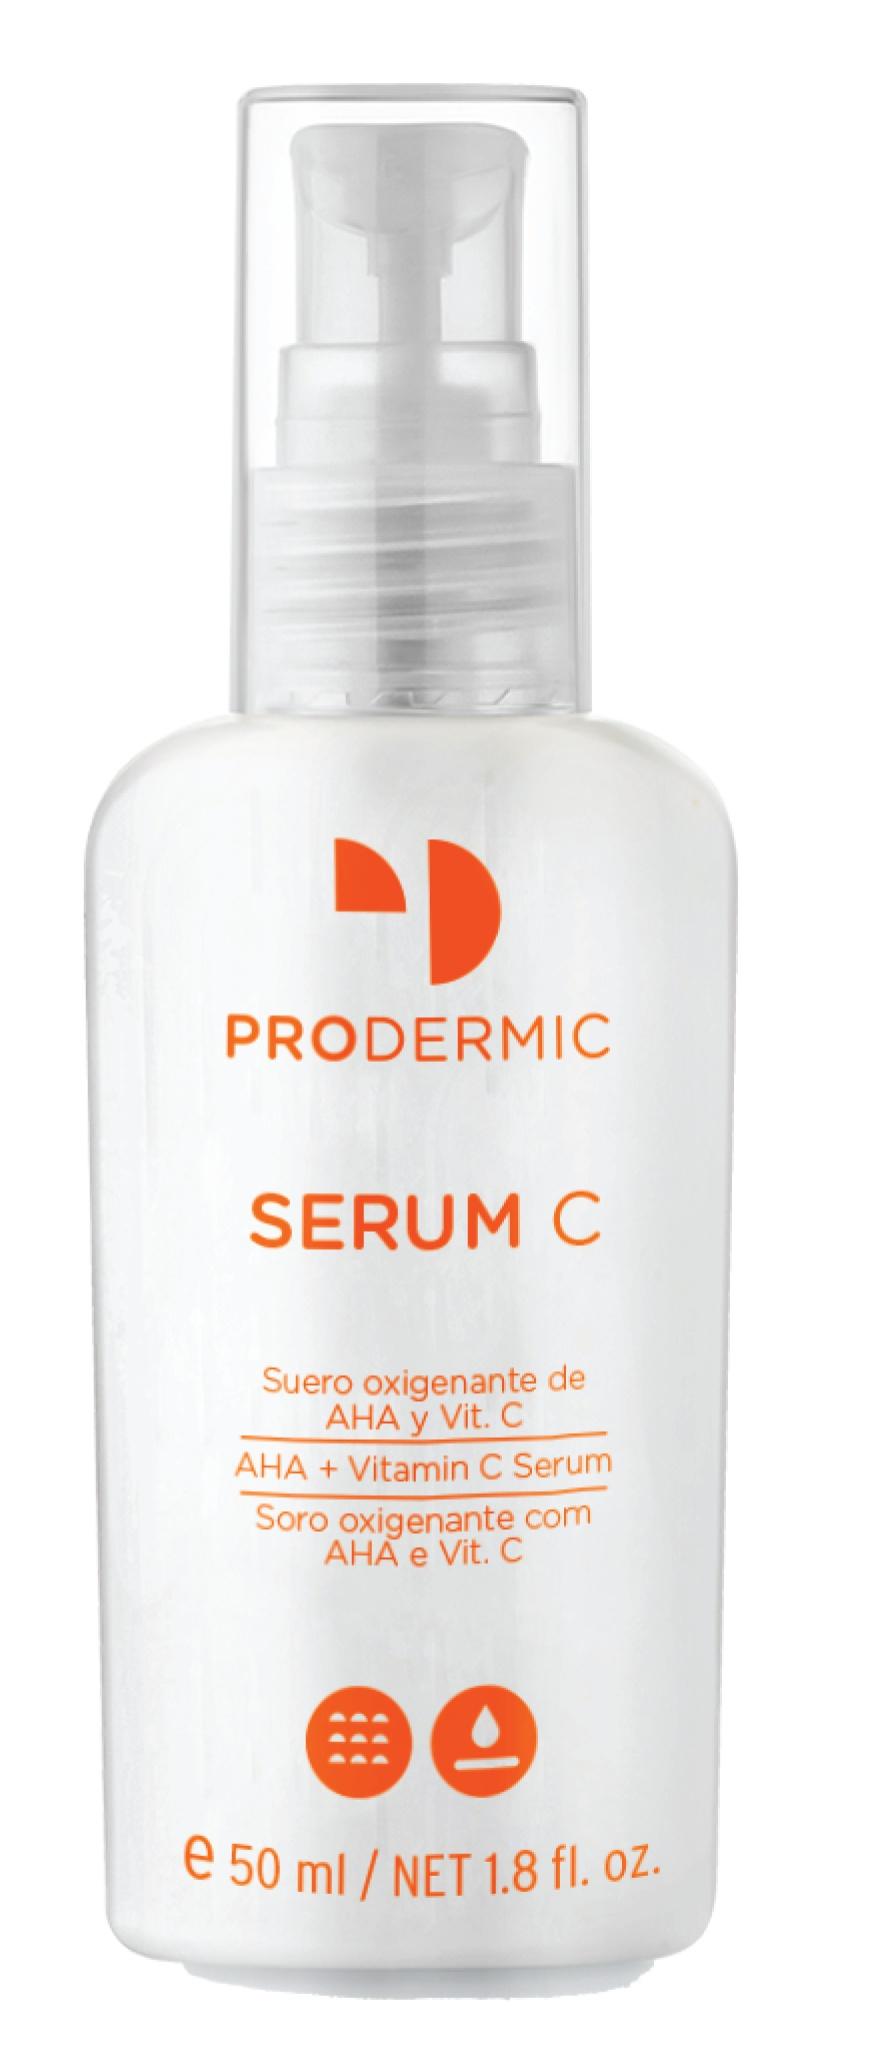 Prodermic Serum C